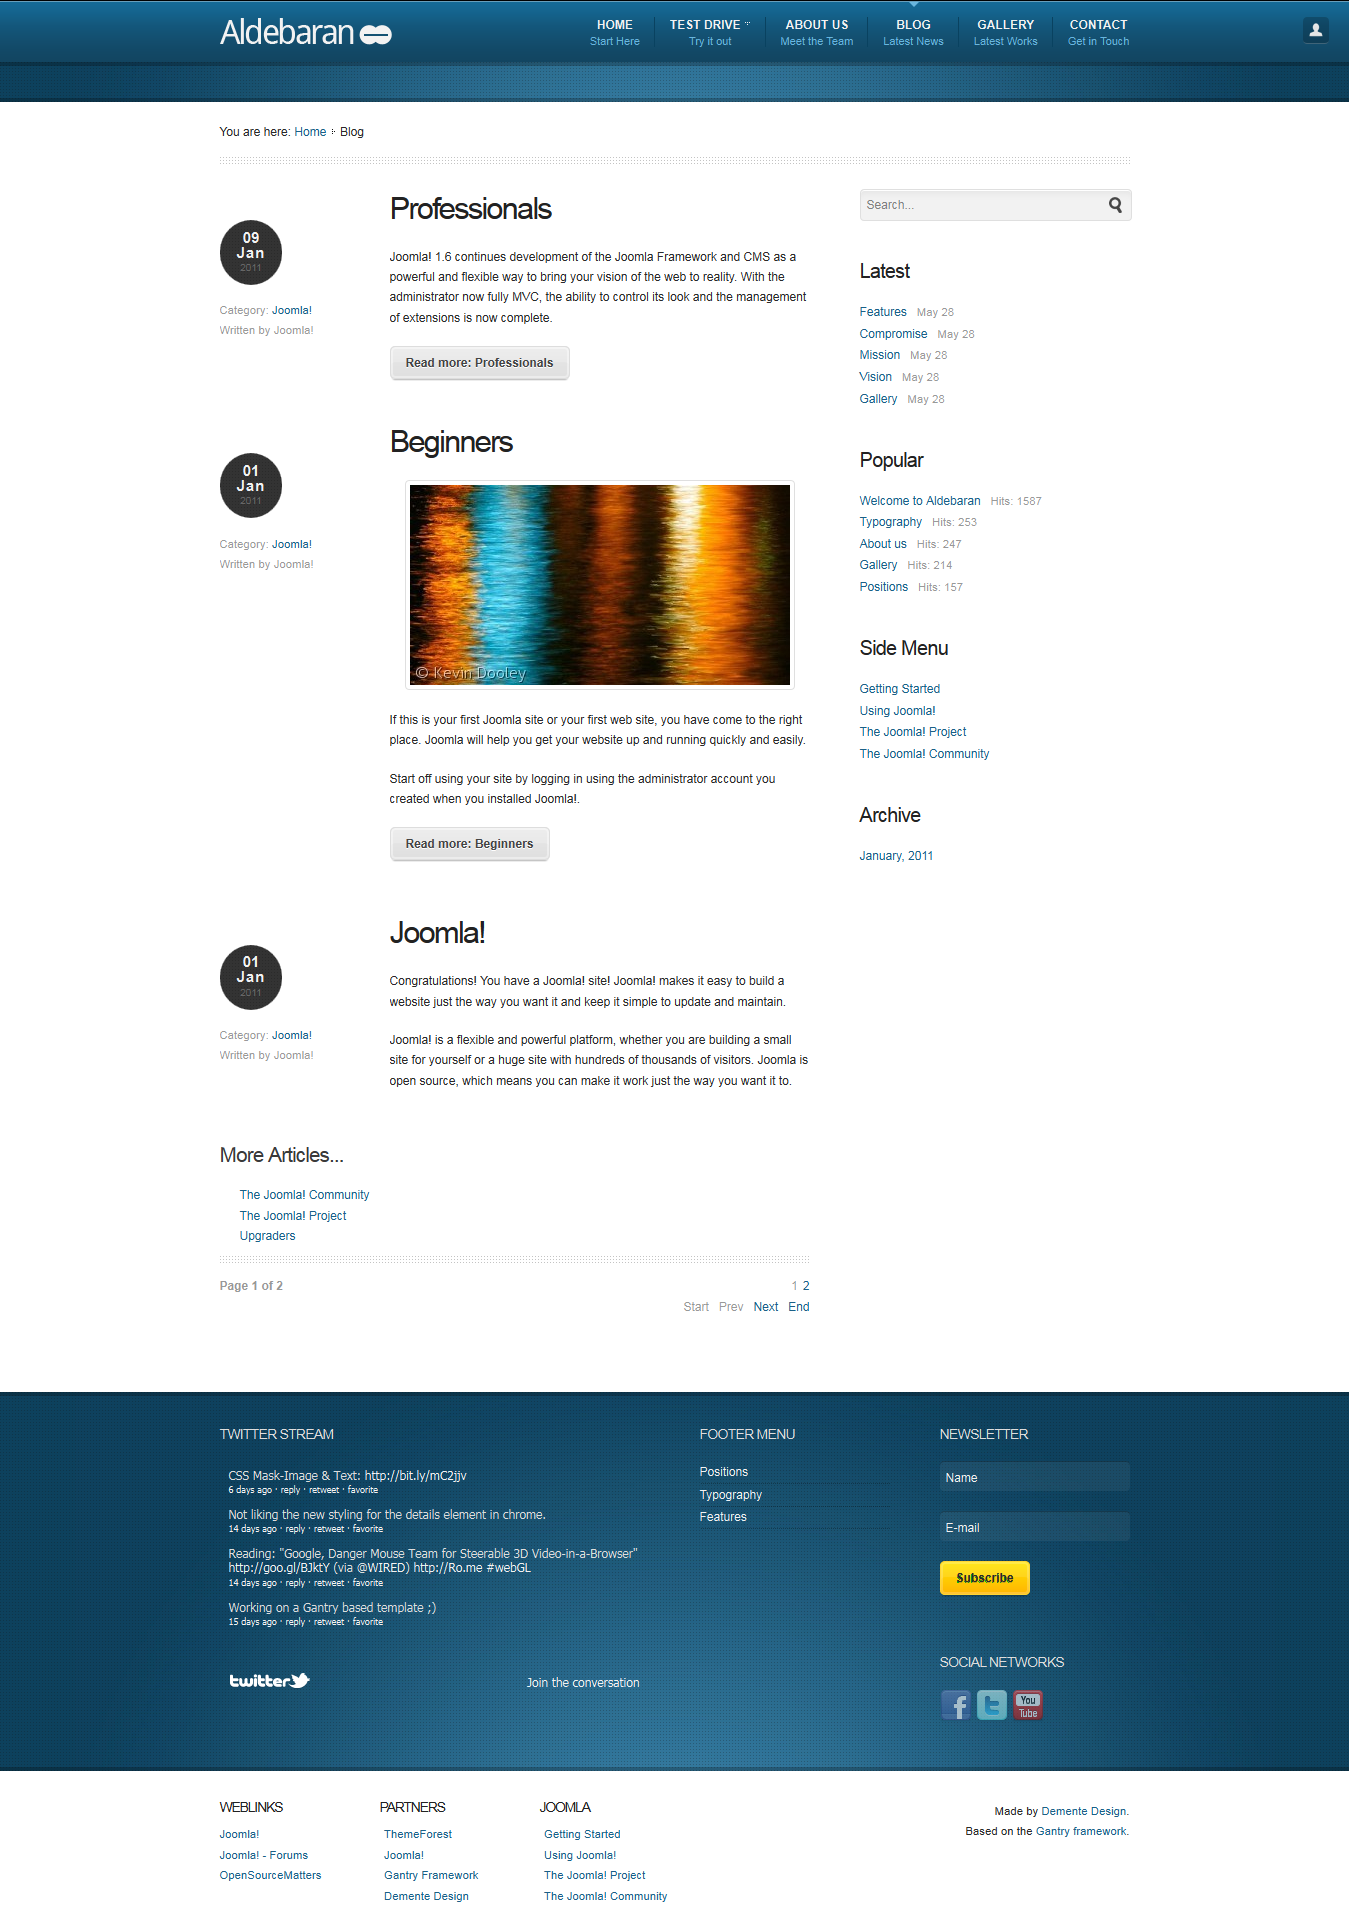 Aldebaran - Joomla 1 6 Business Template